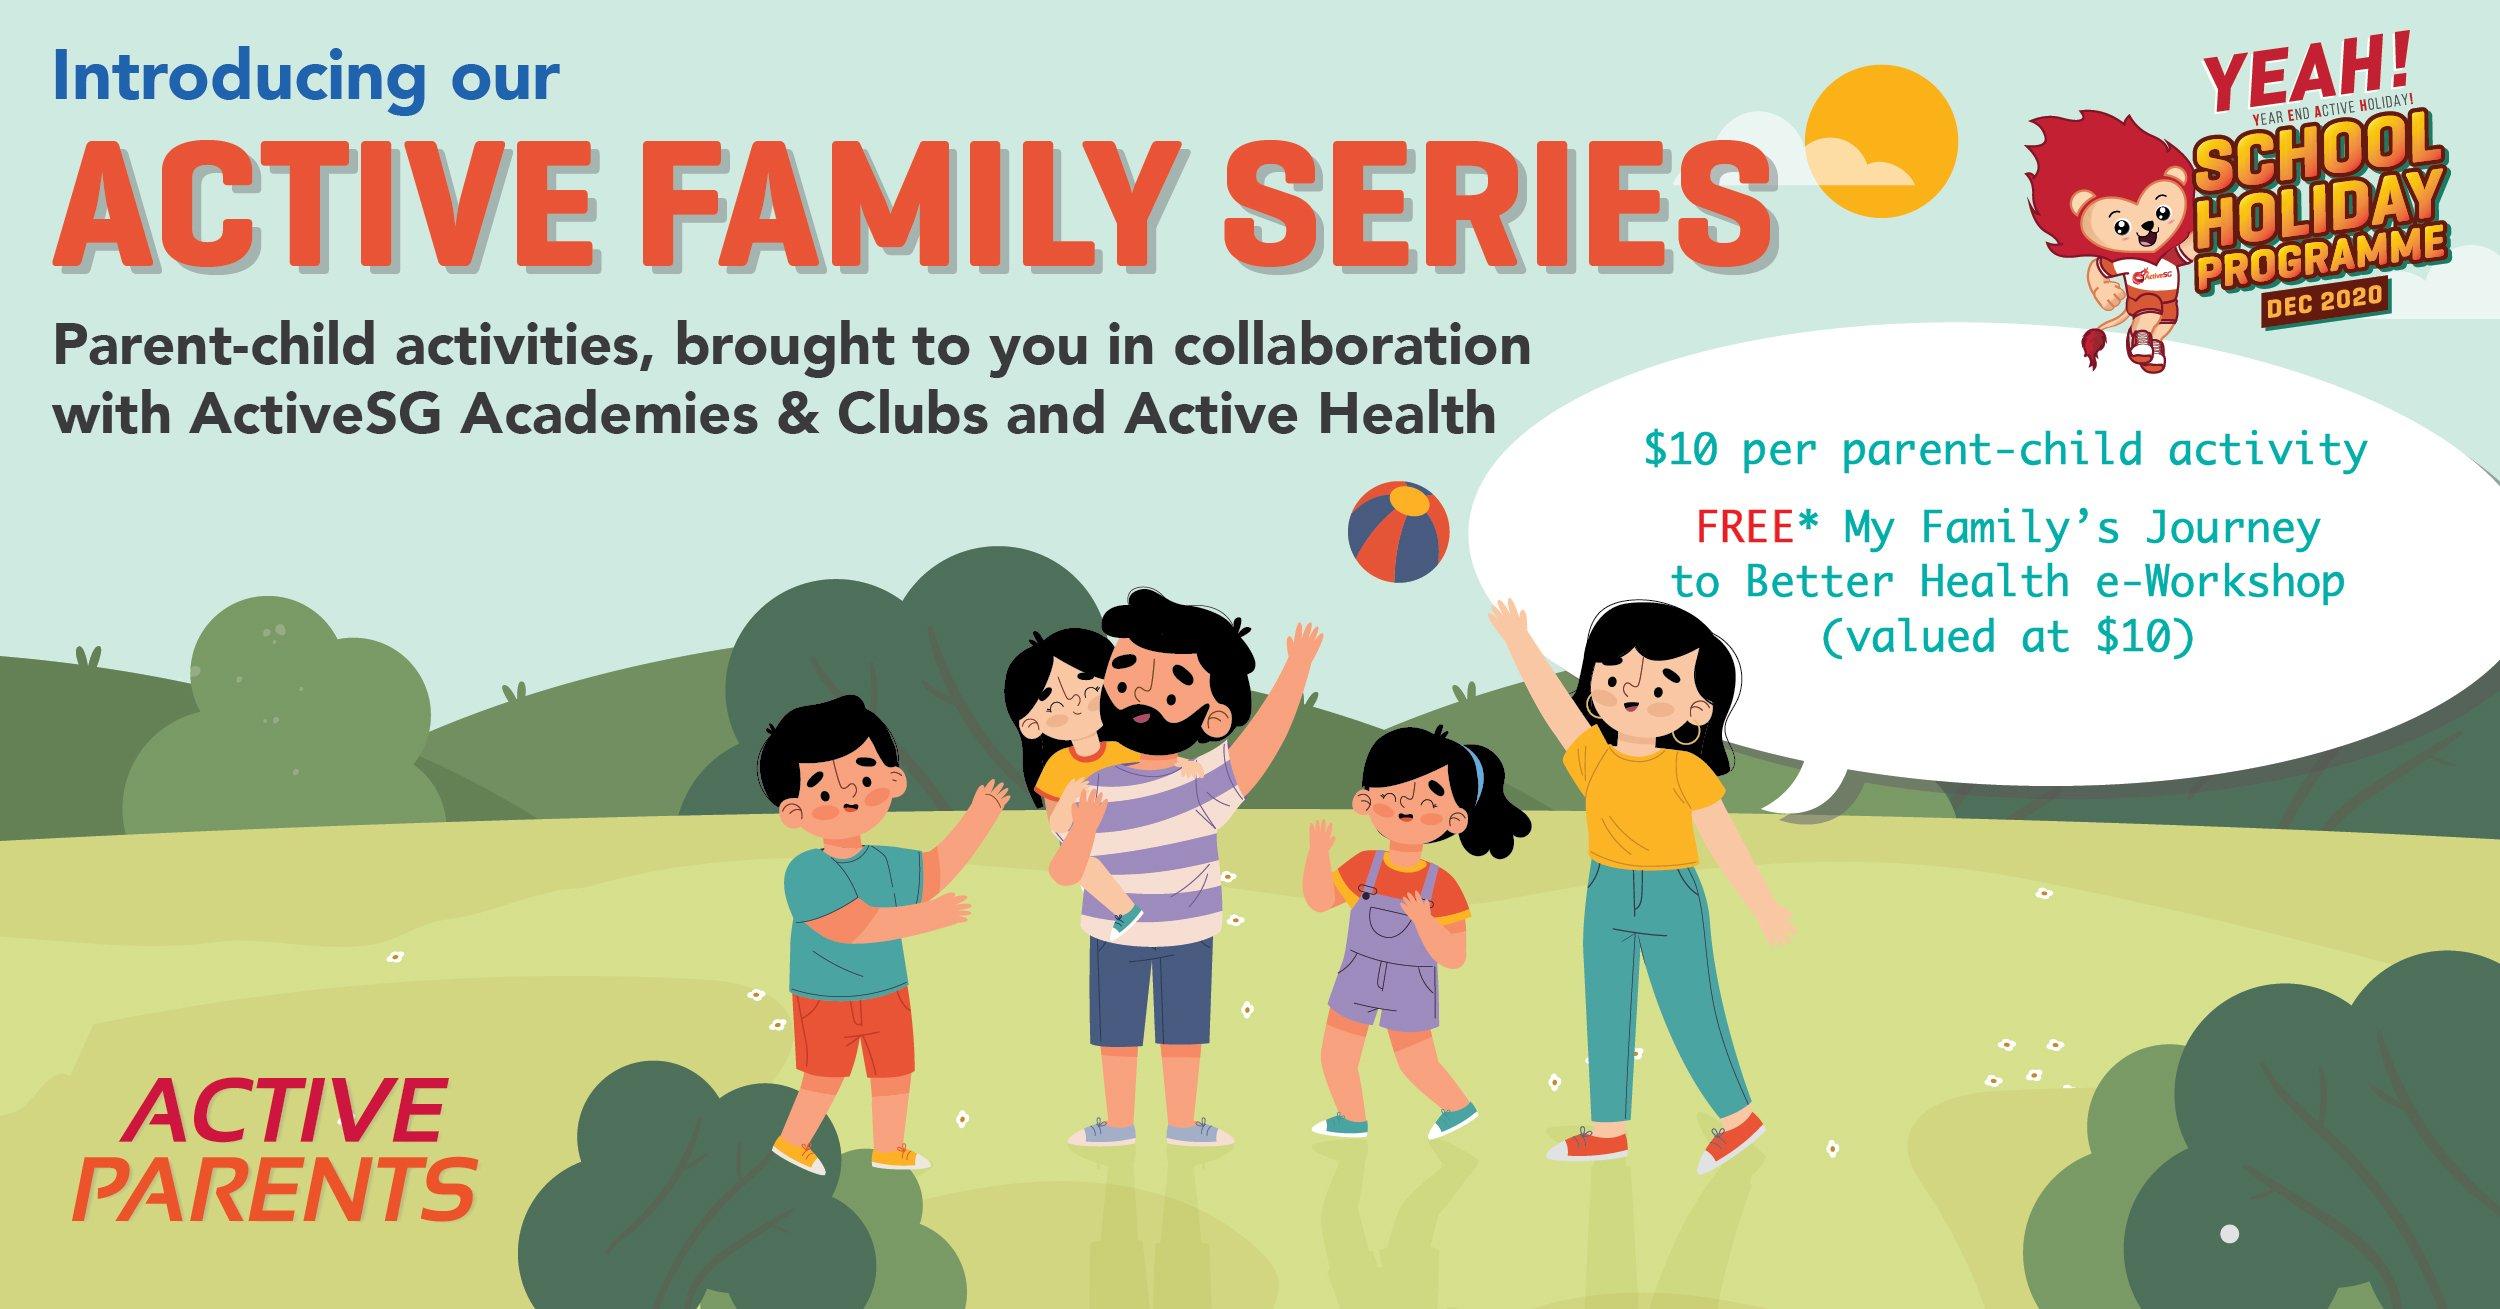 Active Parents Celebration Banners-2 Active Family Series d3 281020-01-150ppi